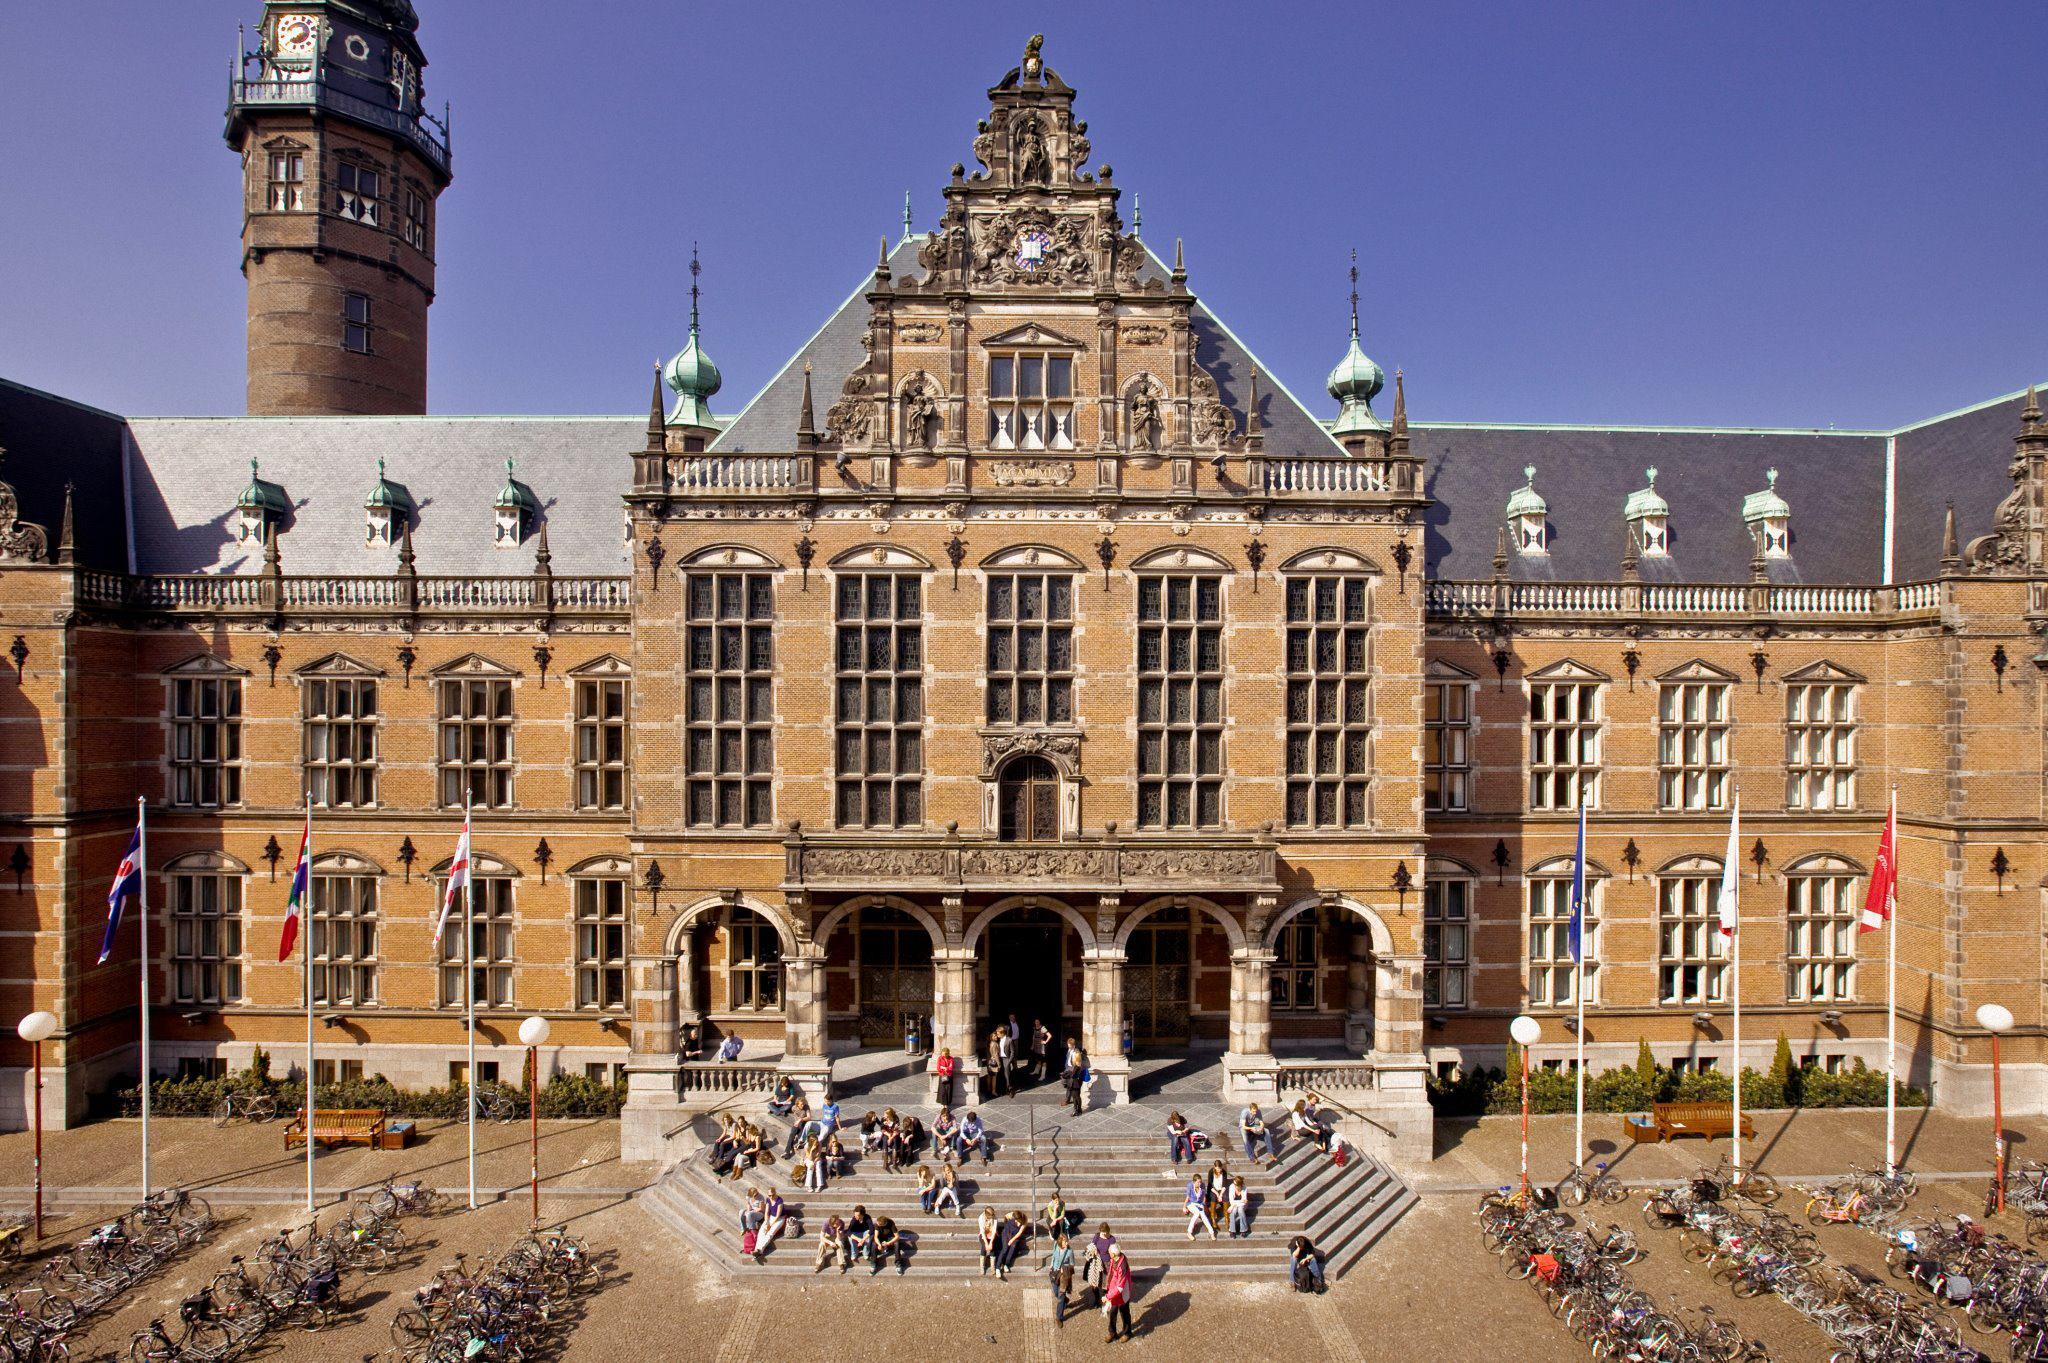 University of Groningen – RUG Campus